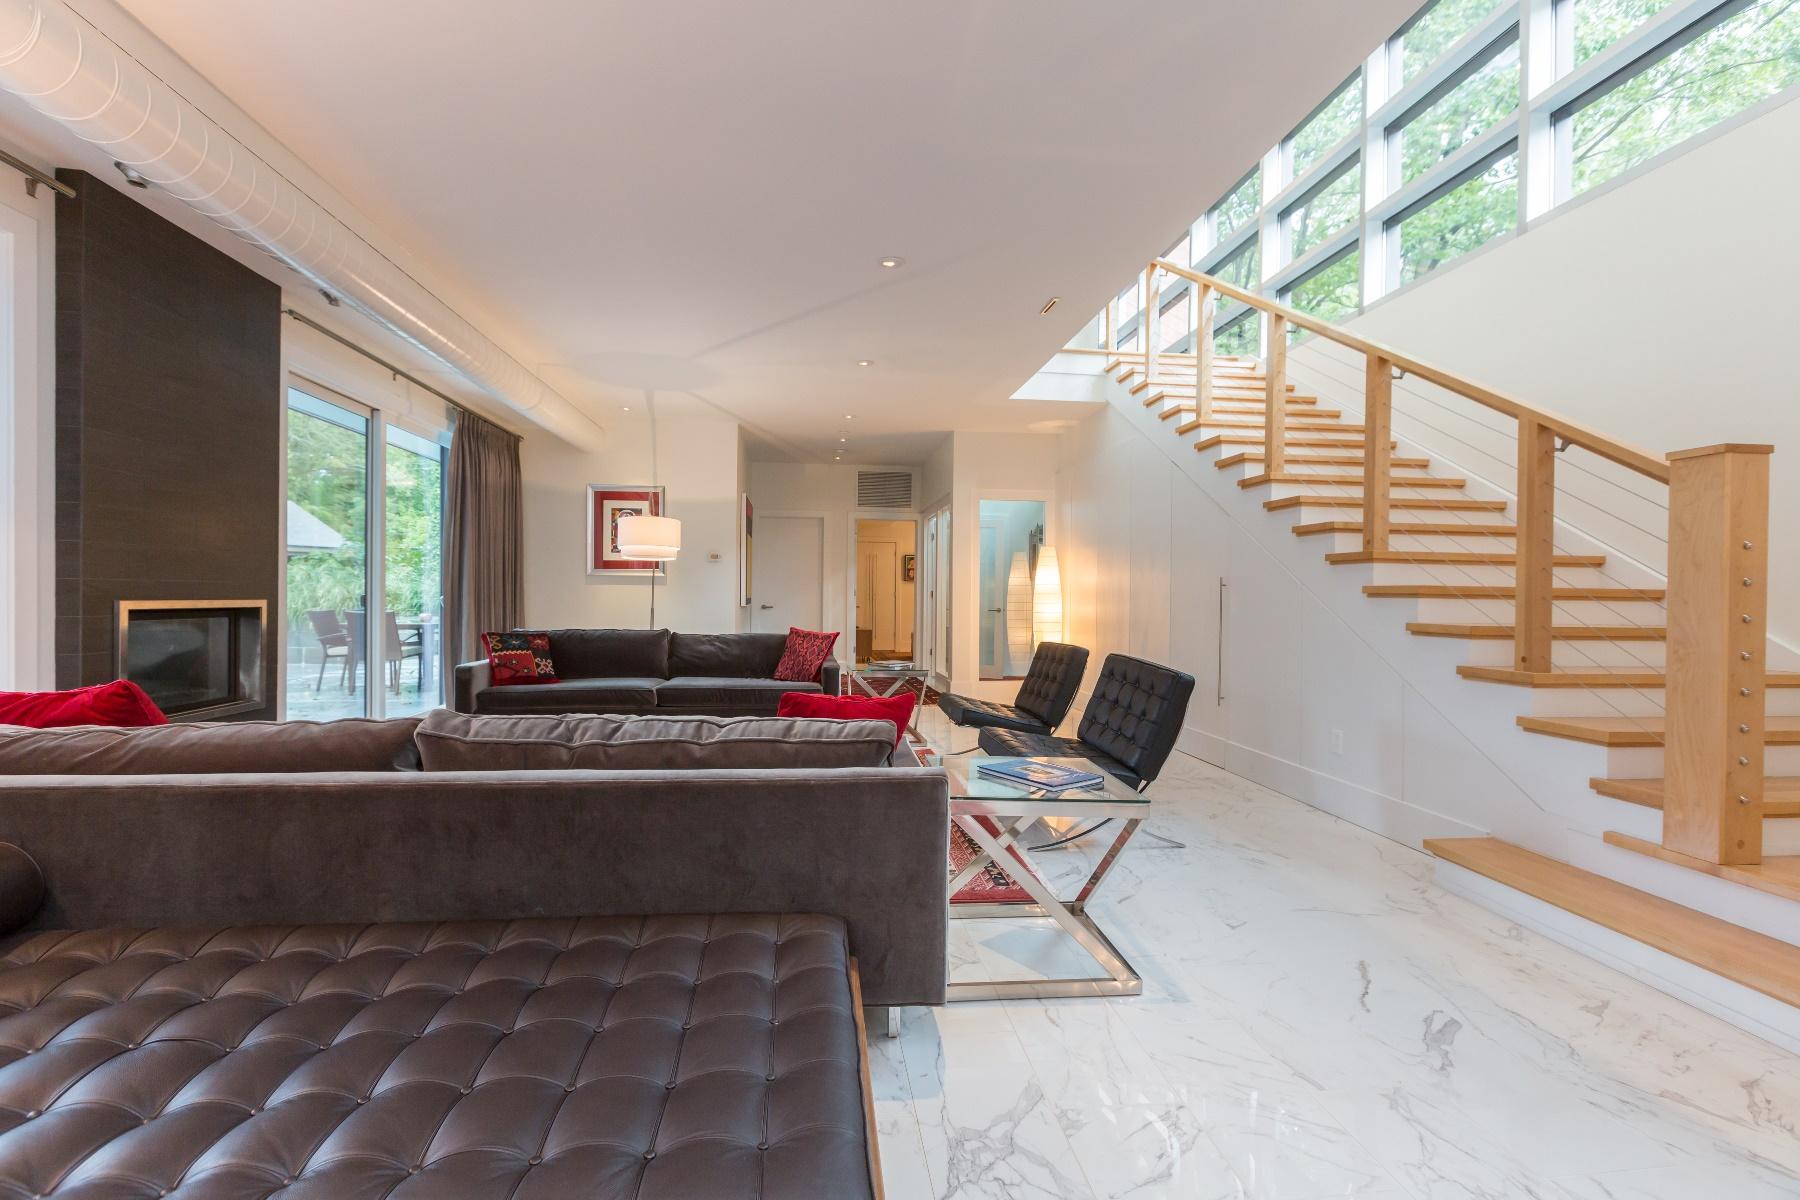 Additional photo for property listing at 6309 Bradley Boulevard, Bethesda 6309 Bradley Blvd Bethesda, Мэриленд 20817 Соединенные Штаты